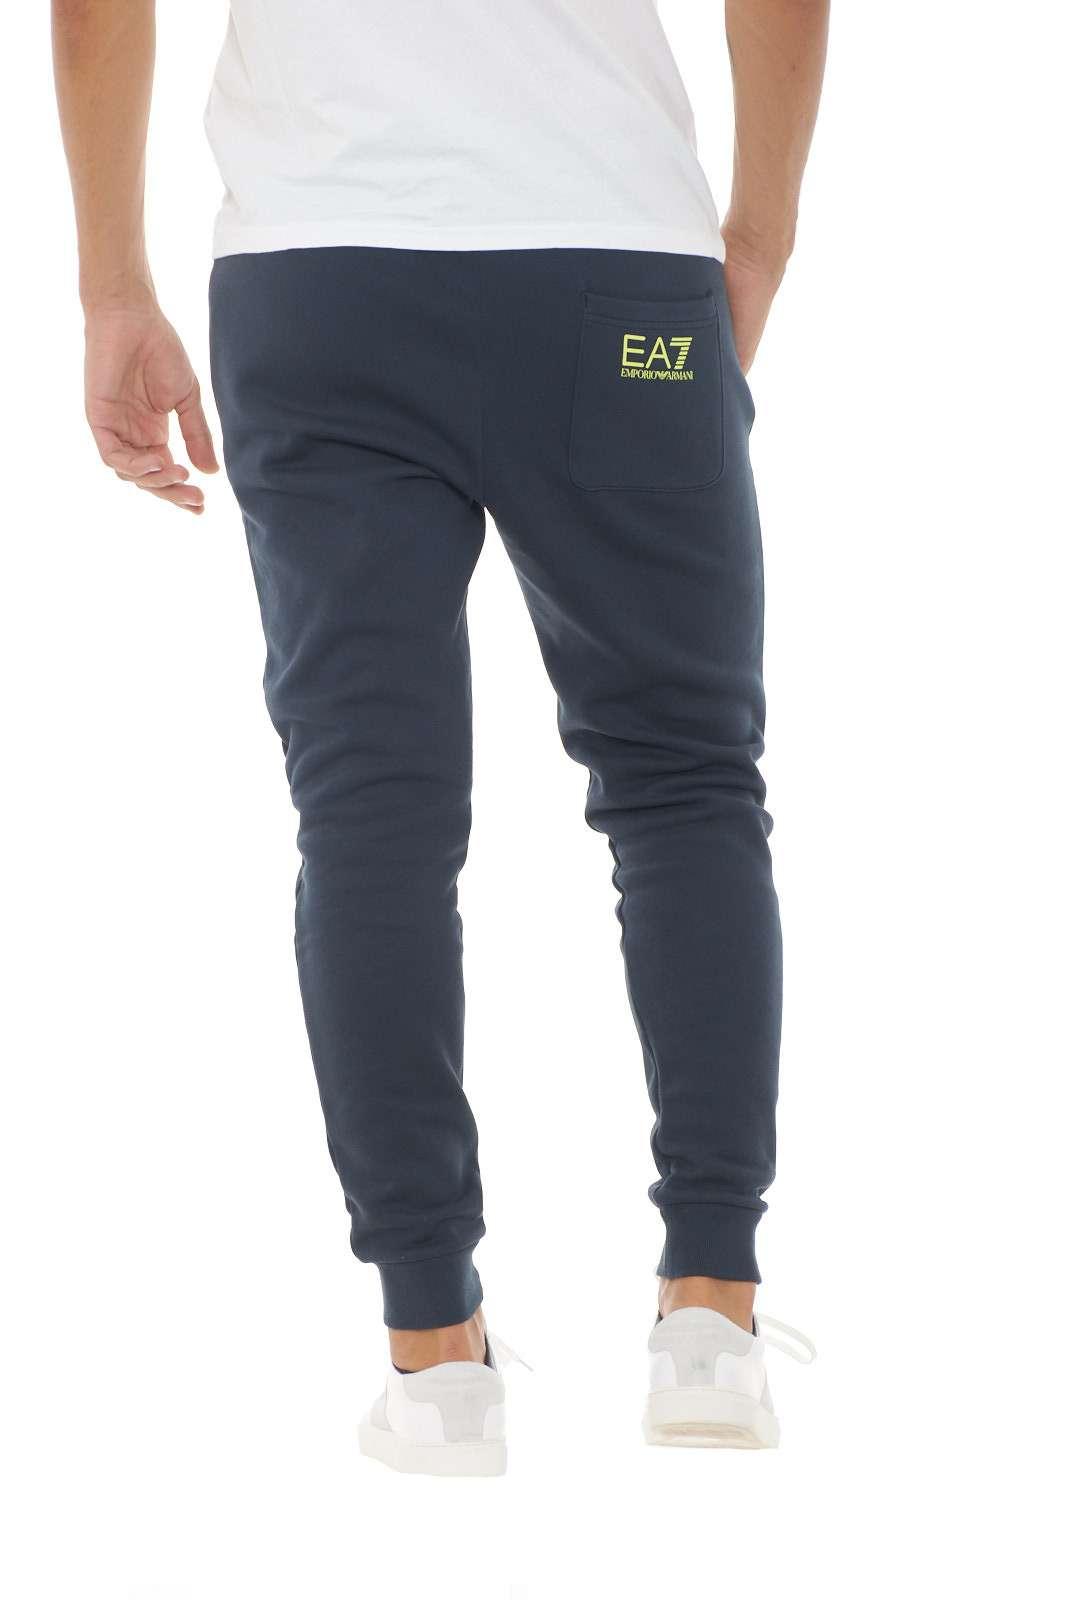 https://www.parmax.com/media/catalog/product/a/i/AI-outlet_parmax-pantaloni-uomo-Emporio-Armani-8NPPB5-C.jpg